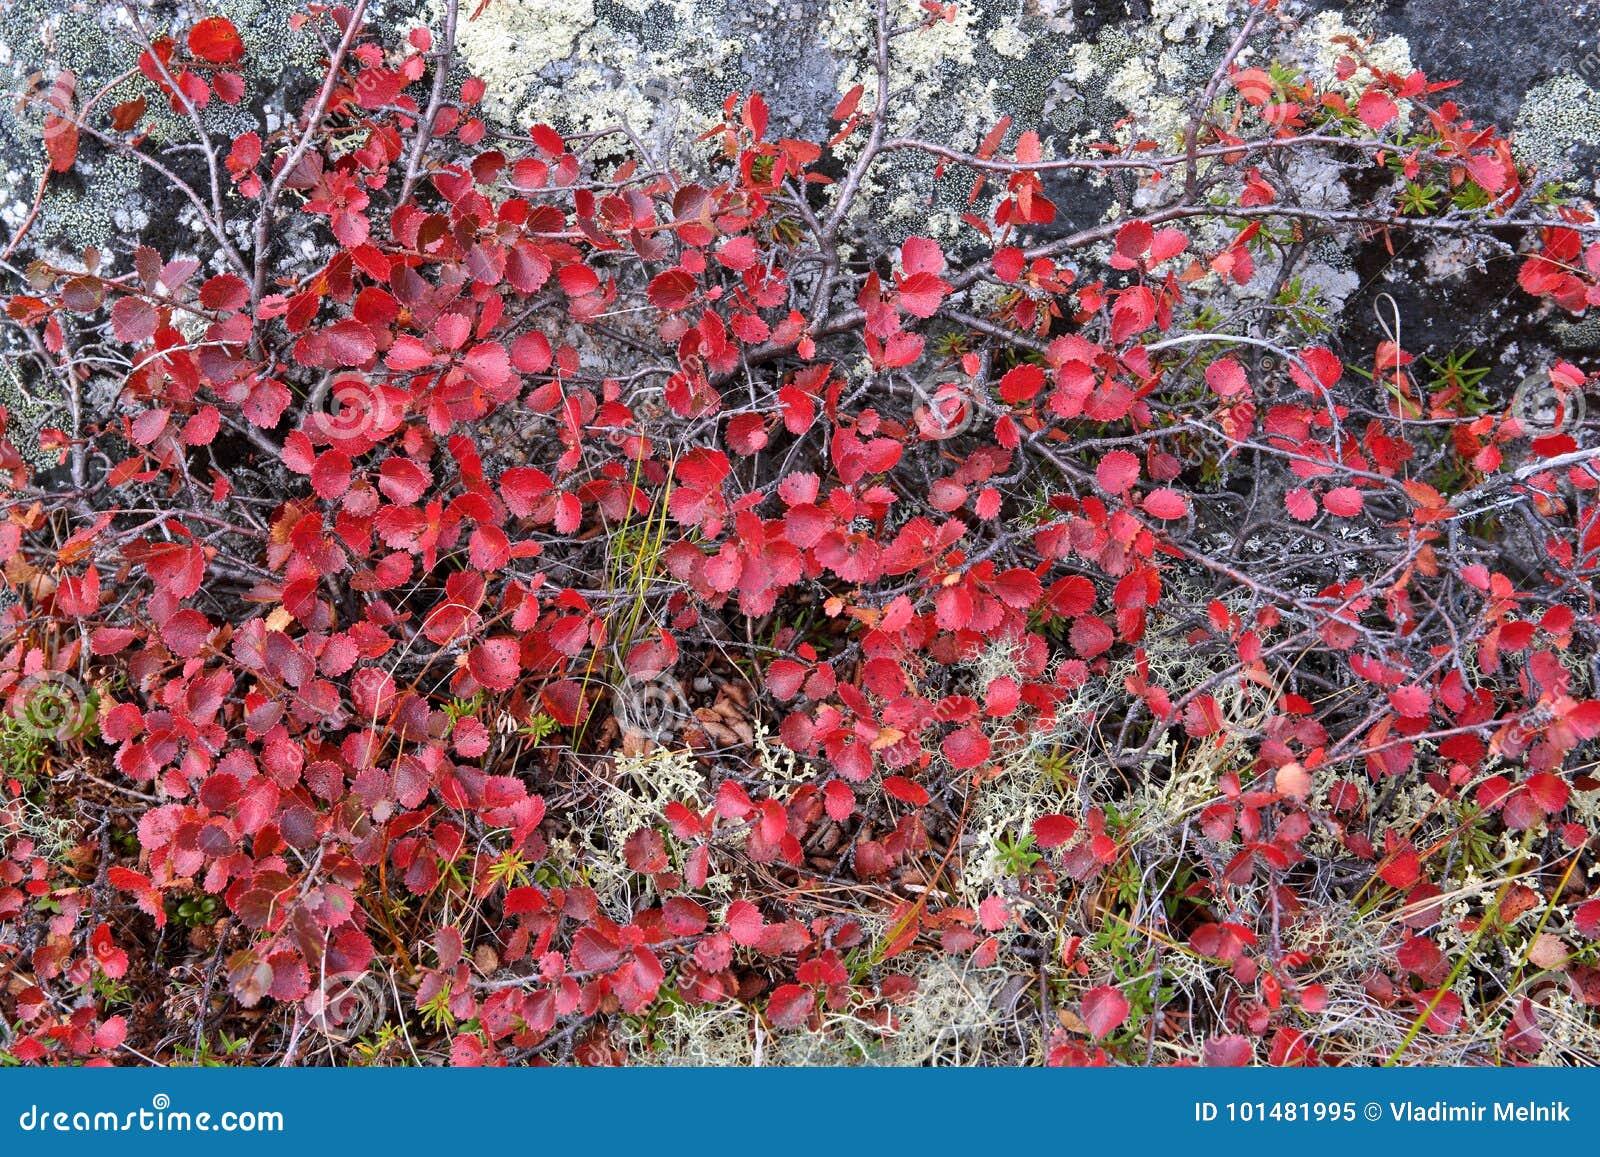 Autumn color palette in tundr